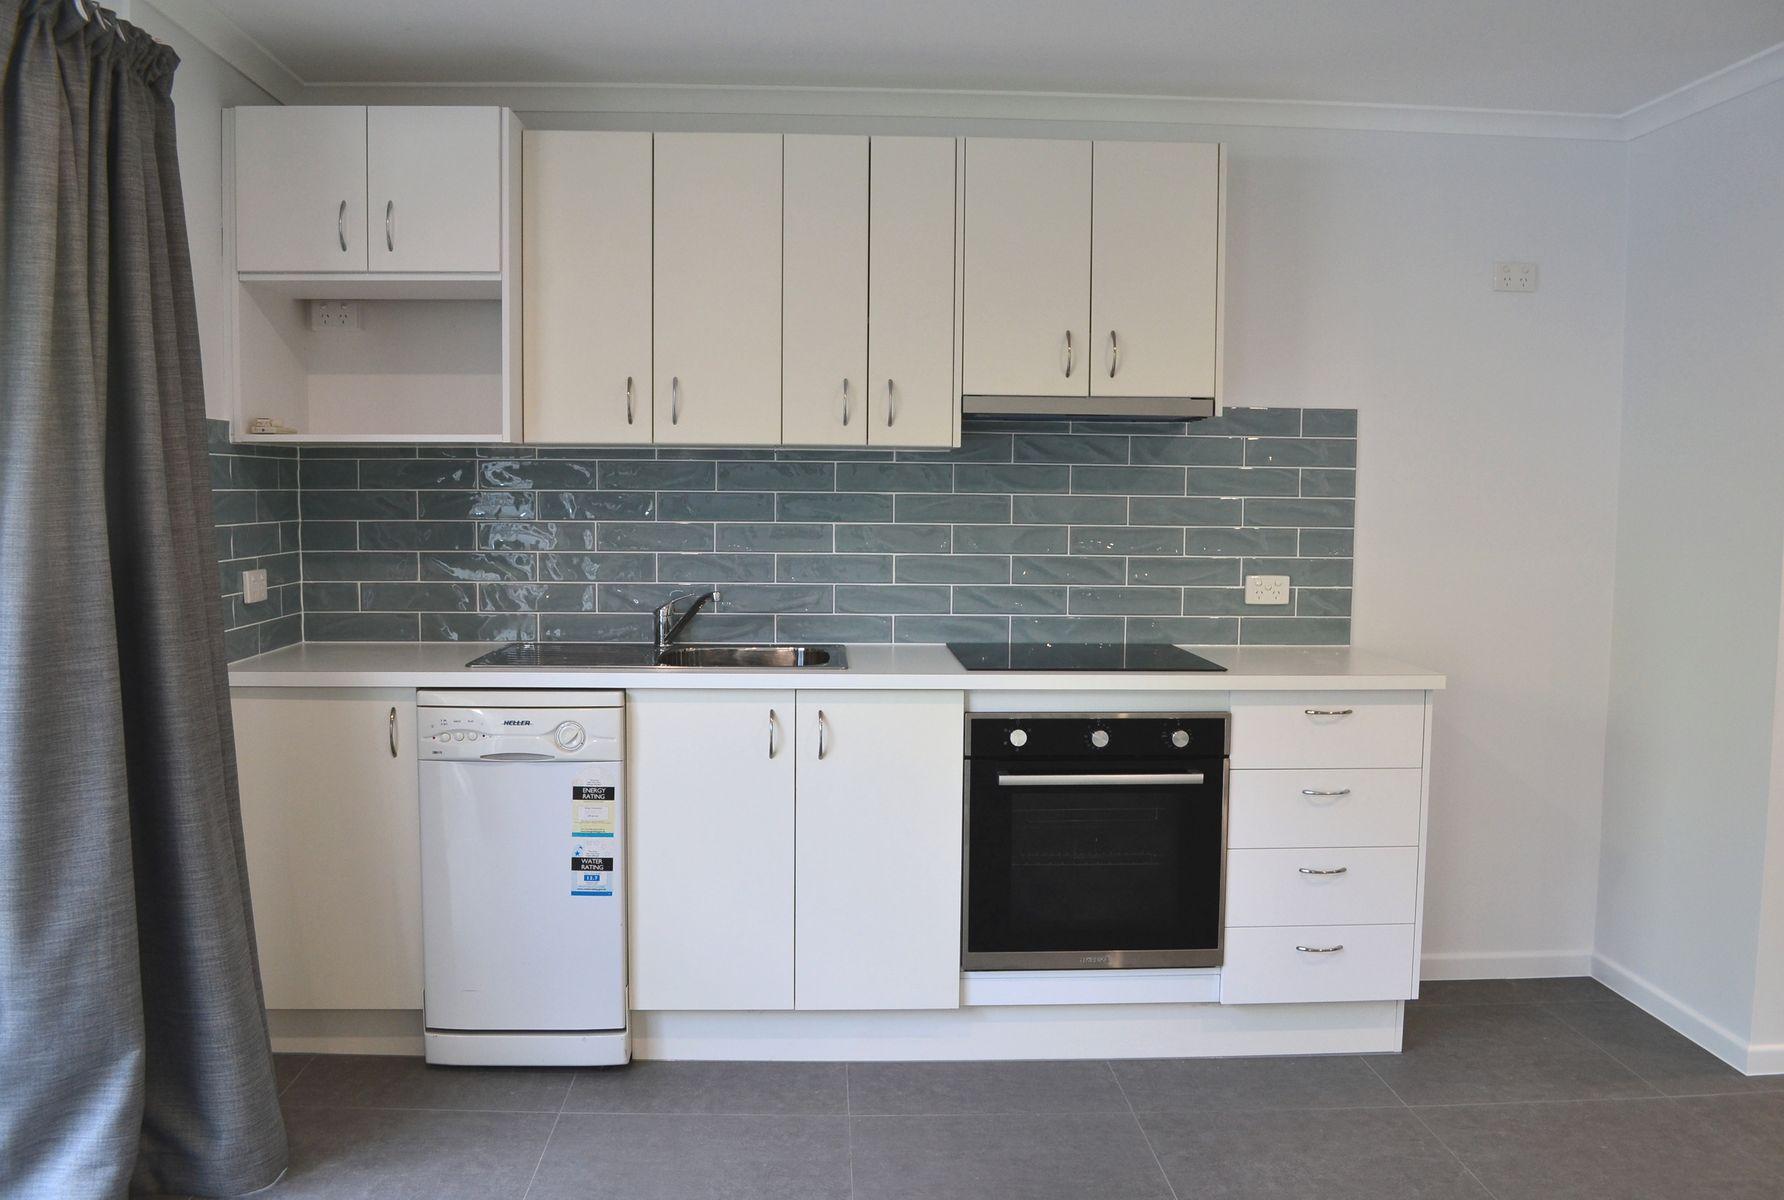 2/3 Florence Street, Nambour, QLD 4560